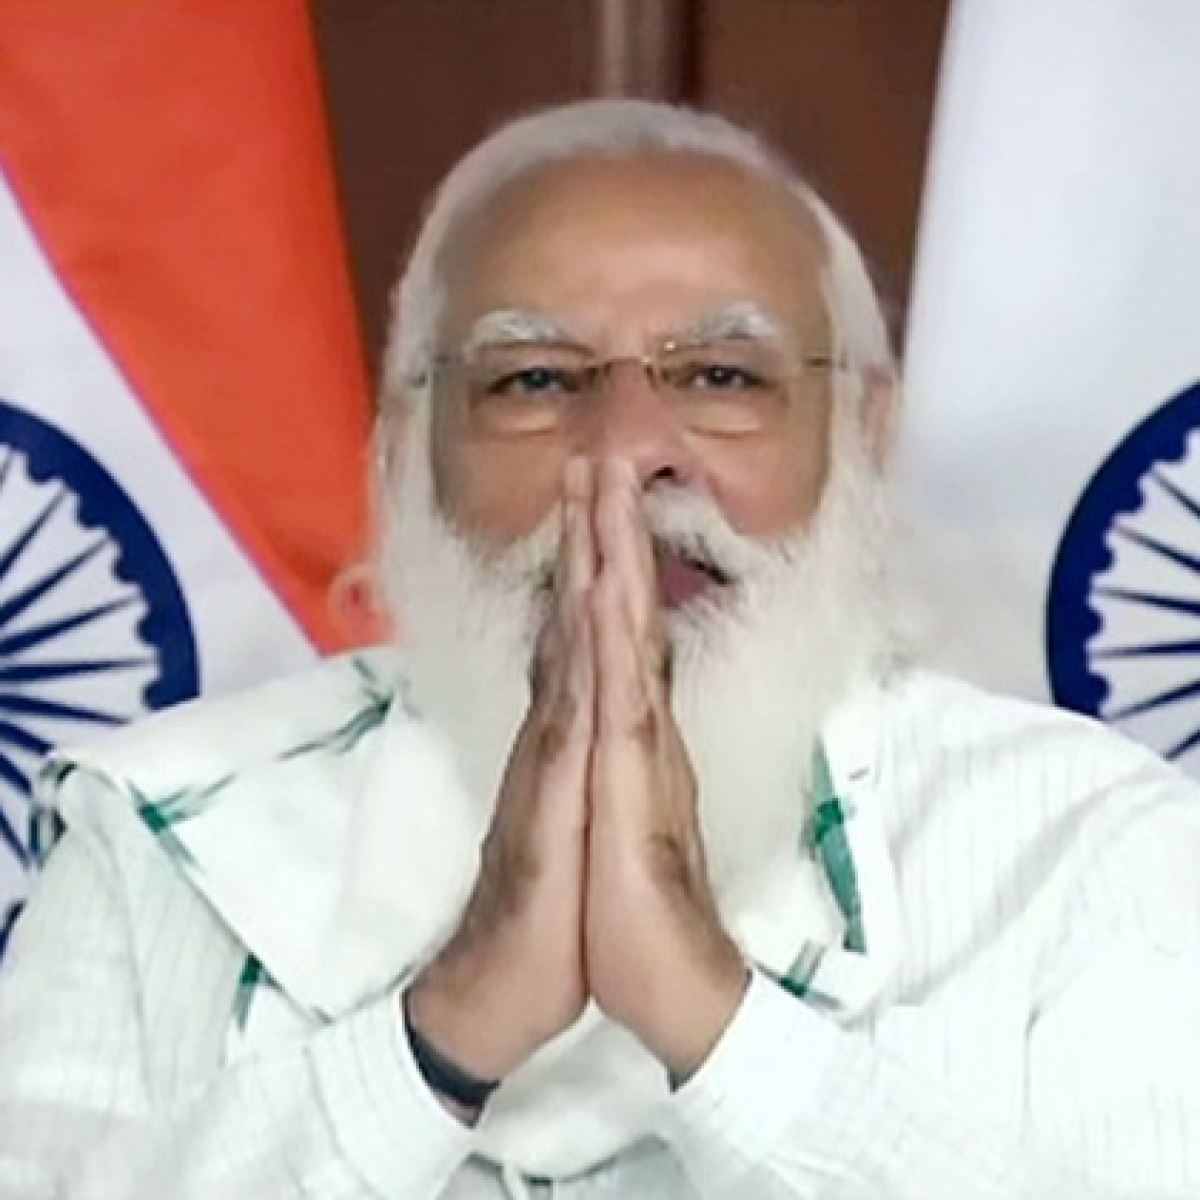 PM Modi to release manuscript on shlokas of Srimad Bhagavadgita on March 9